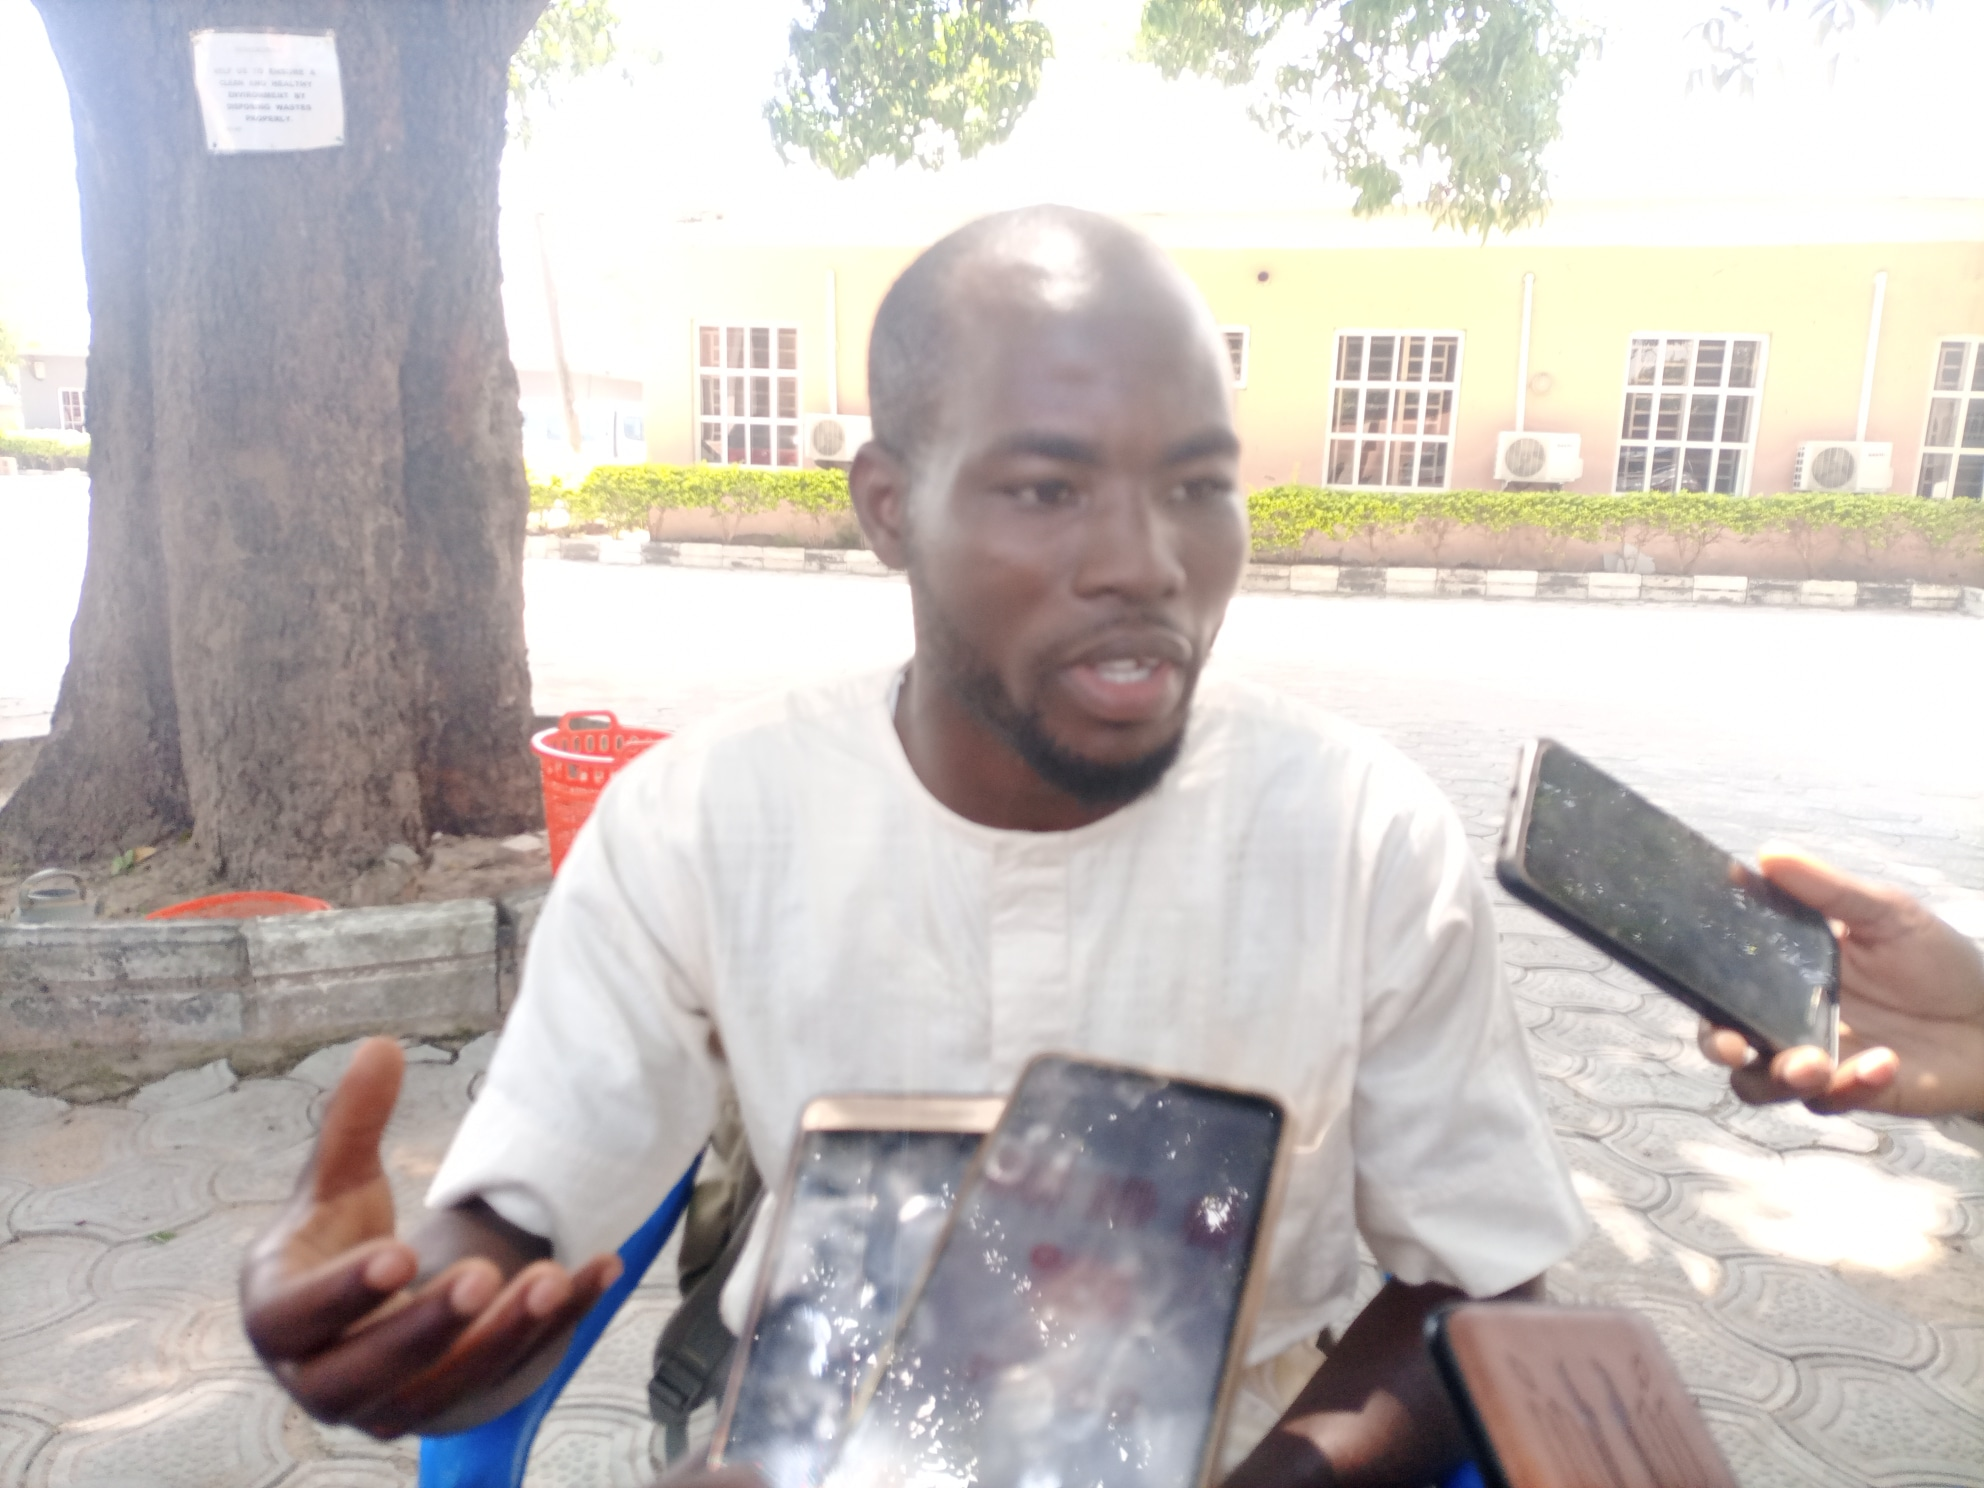 JTF Personnel Brutalises Civilian in Bauchi - Victim Narrates Ordeal, Appeal for Justice